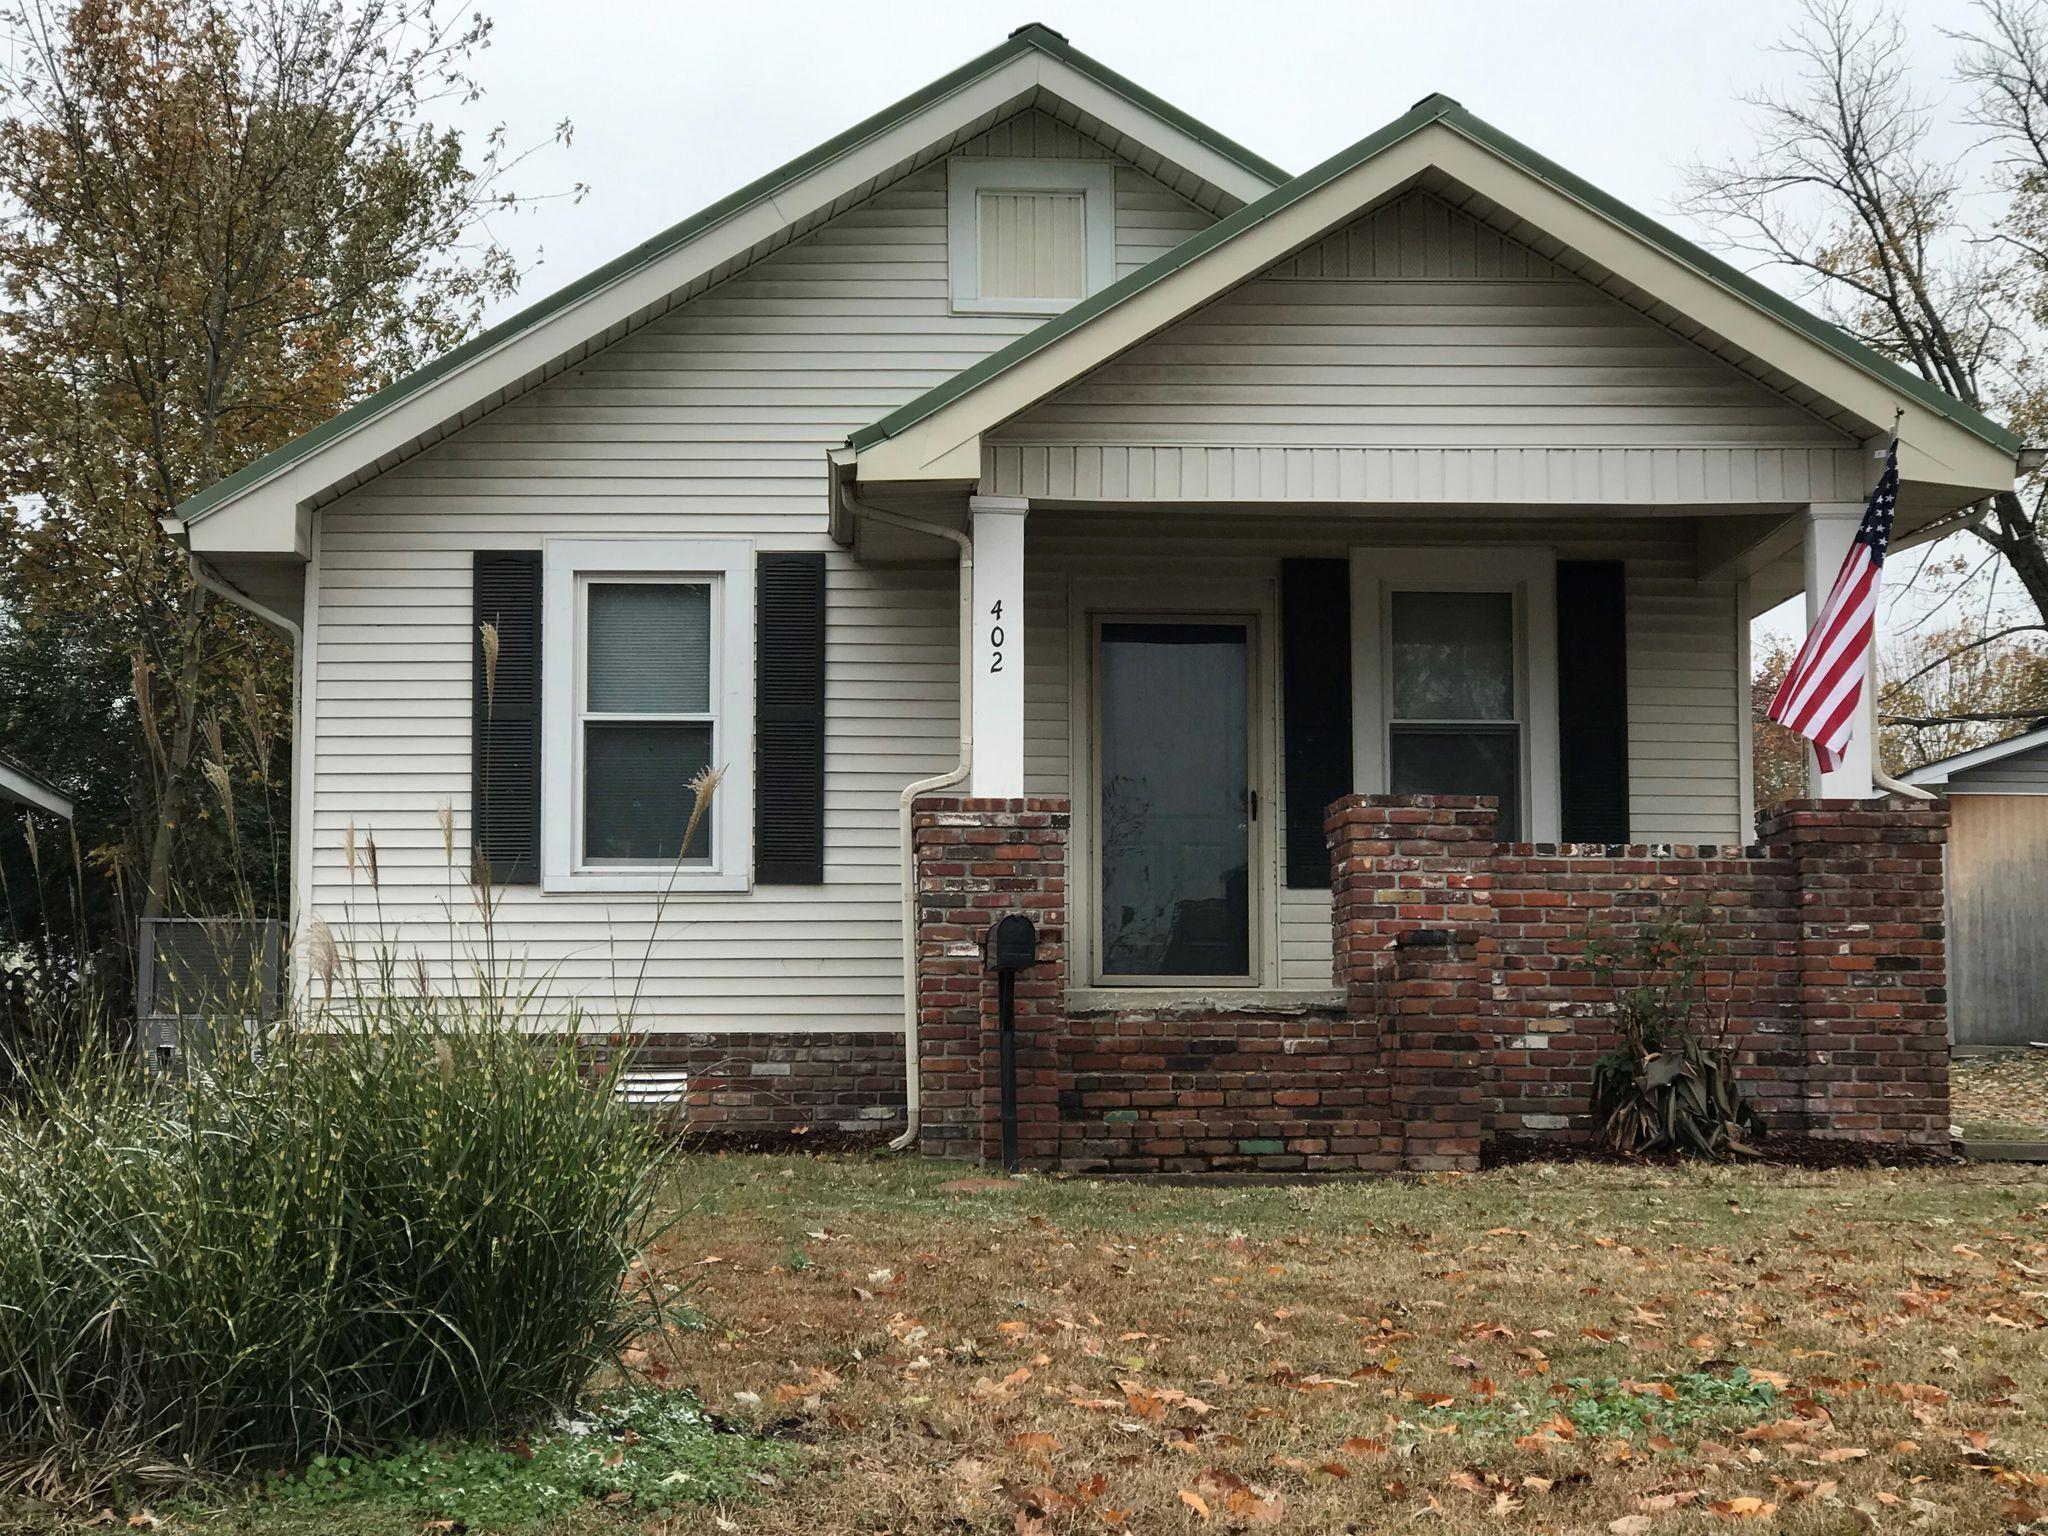 402 Glendale St, South Fulton, TN 38257 - 3 Bed, 1 Bath Single-Family Home  - MLS #40551 - 21 Photos | Trulia